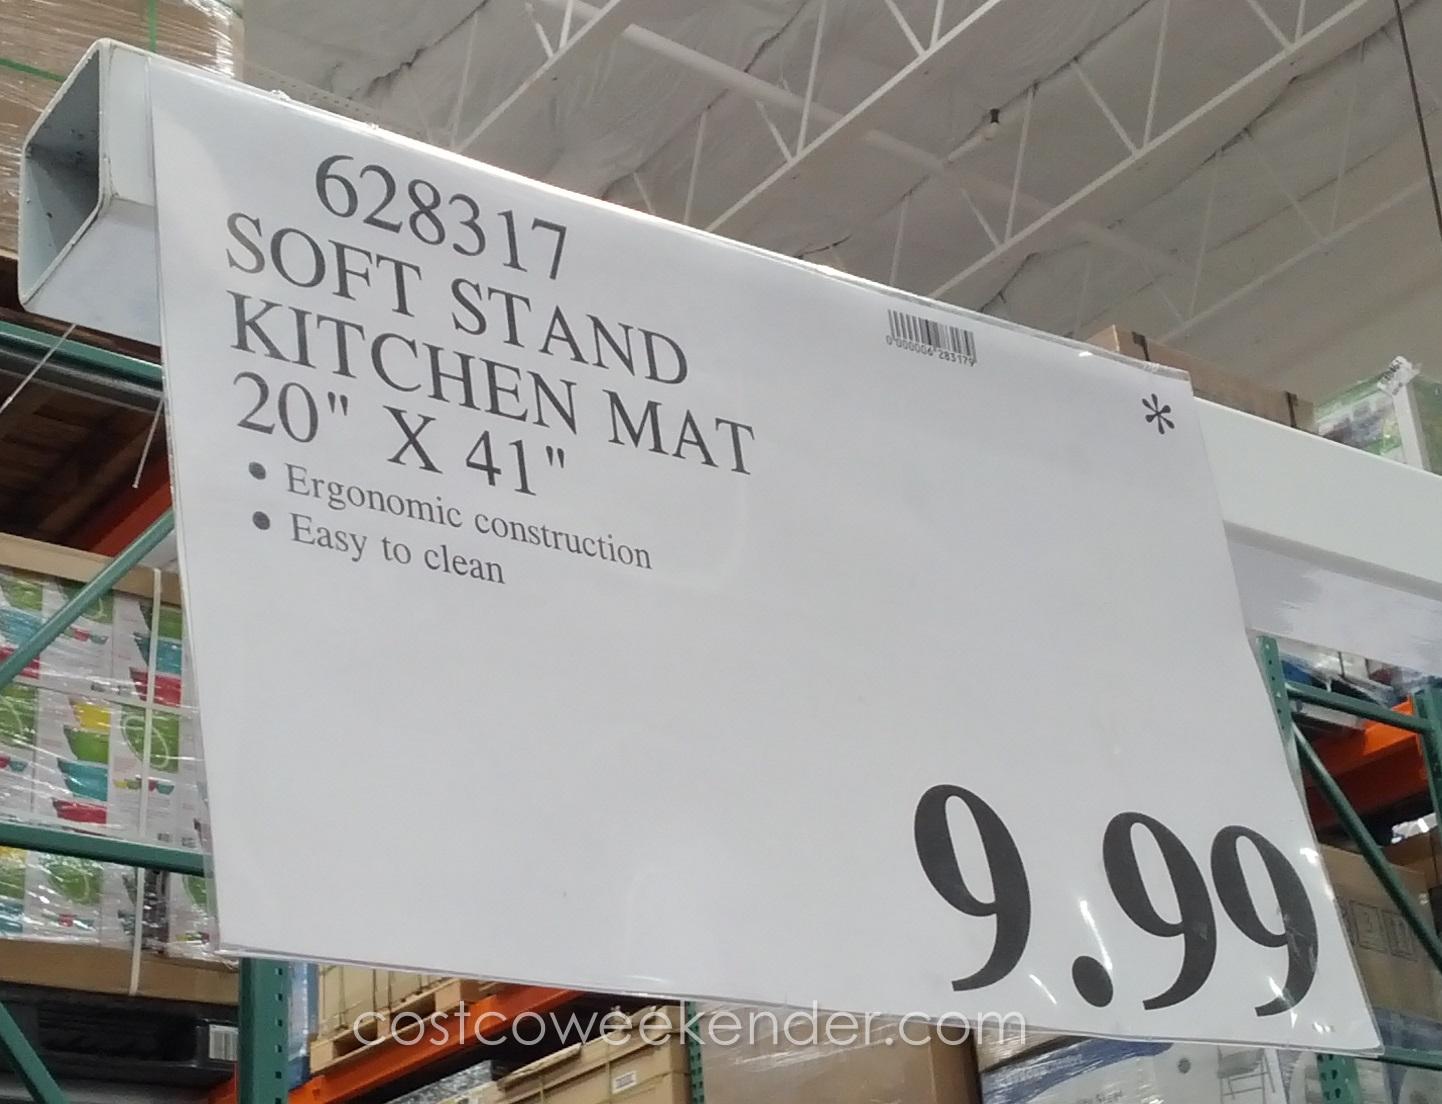 Novaform Kitchen Mat Remodeling Software Apache Mills Soft Stand   Costco Weekender